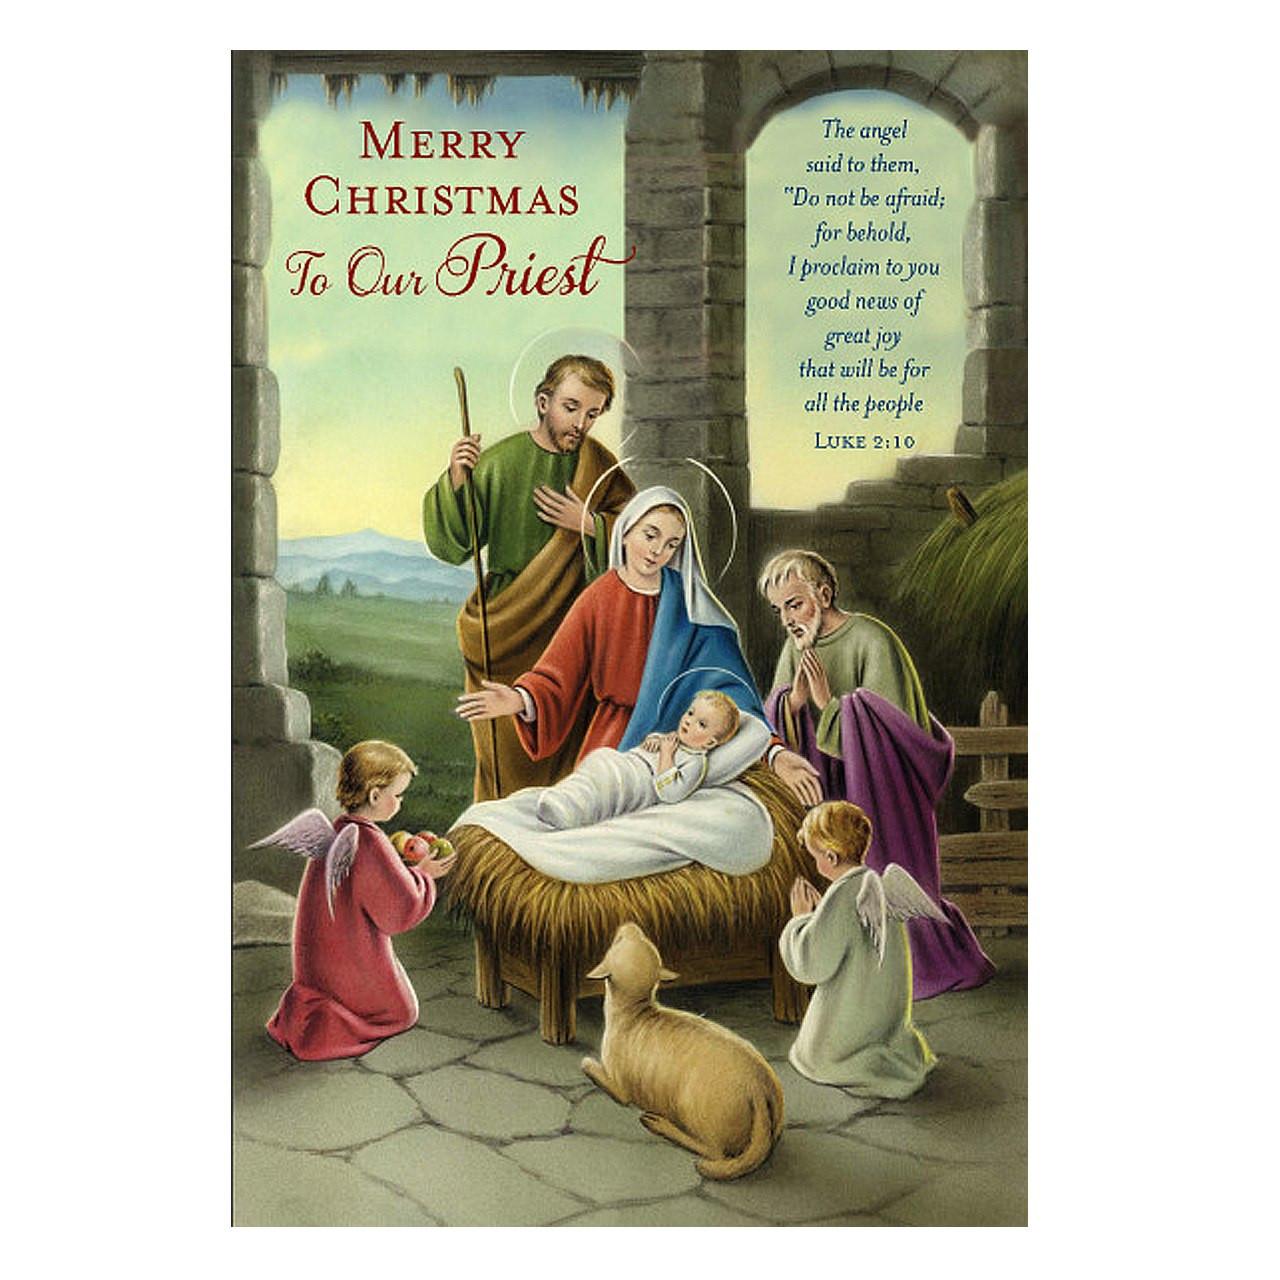 Christmas Greeting Cards.Christmas Greeting Card For Priest Nativity Luke 2 10 6 3 4 89980